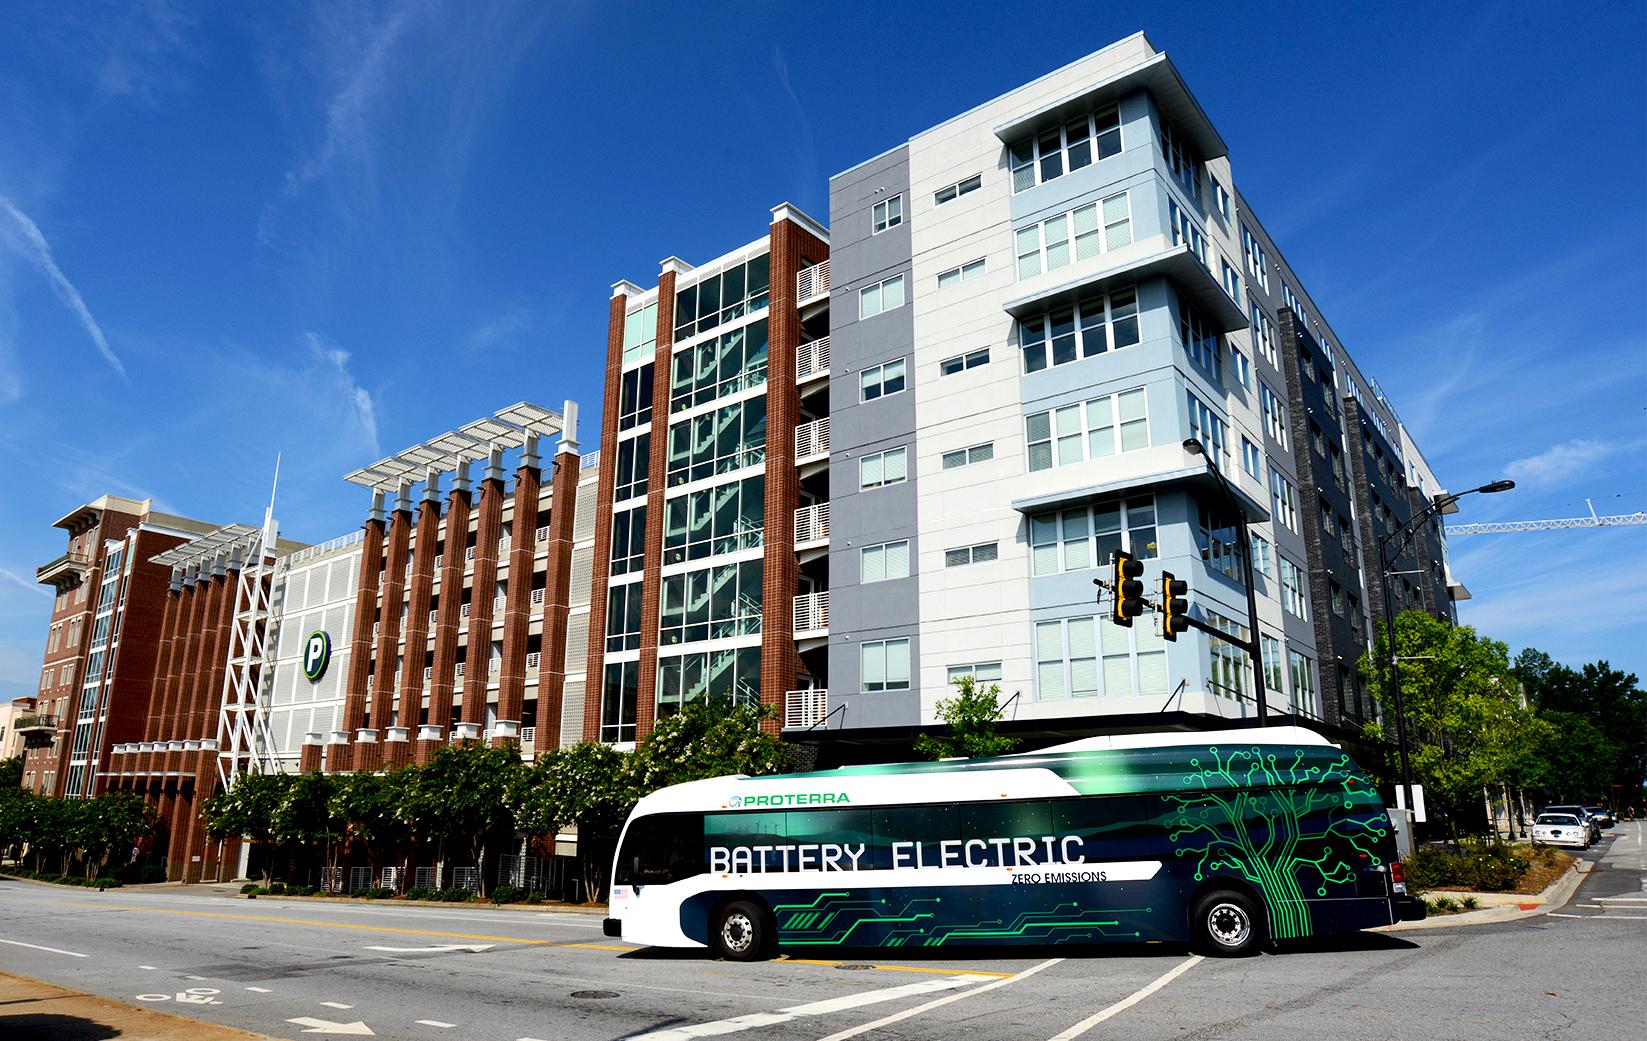 Proterra New Bus.jpg